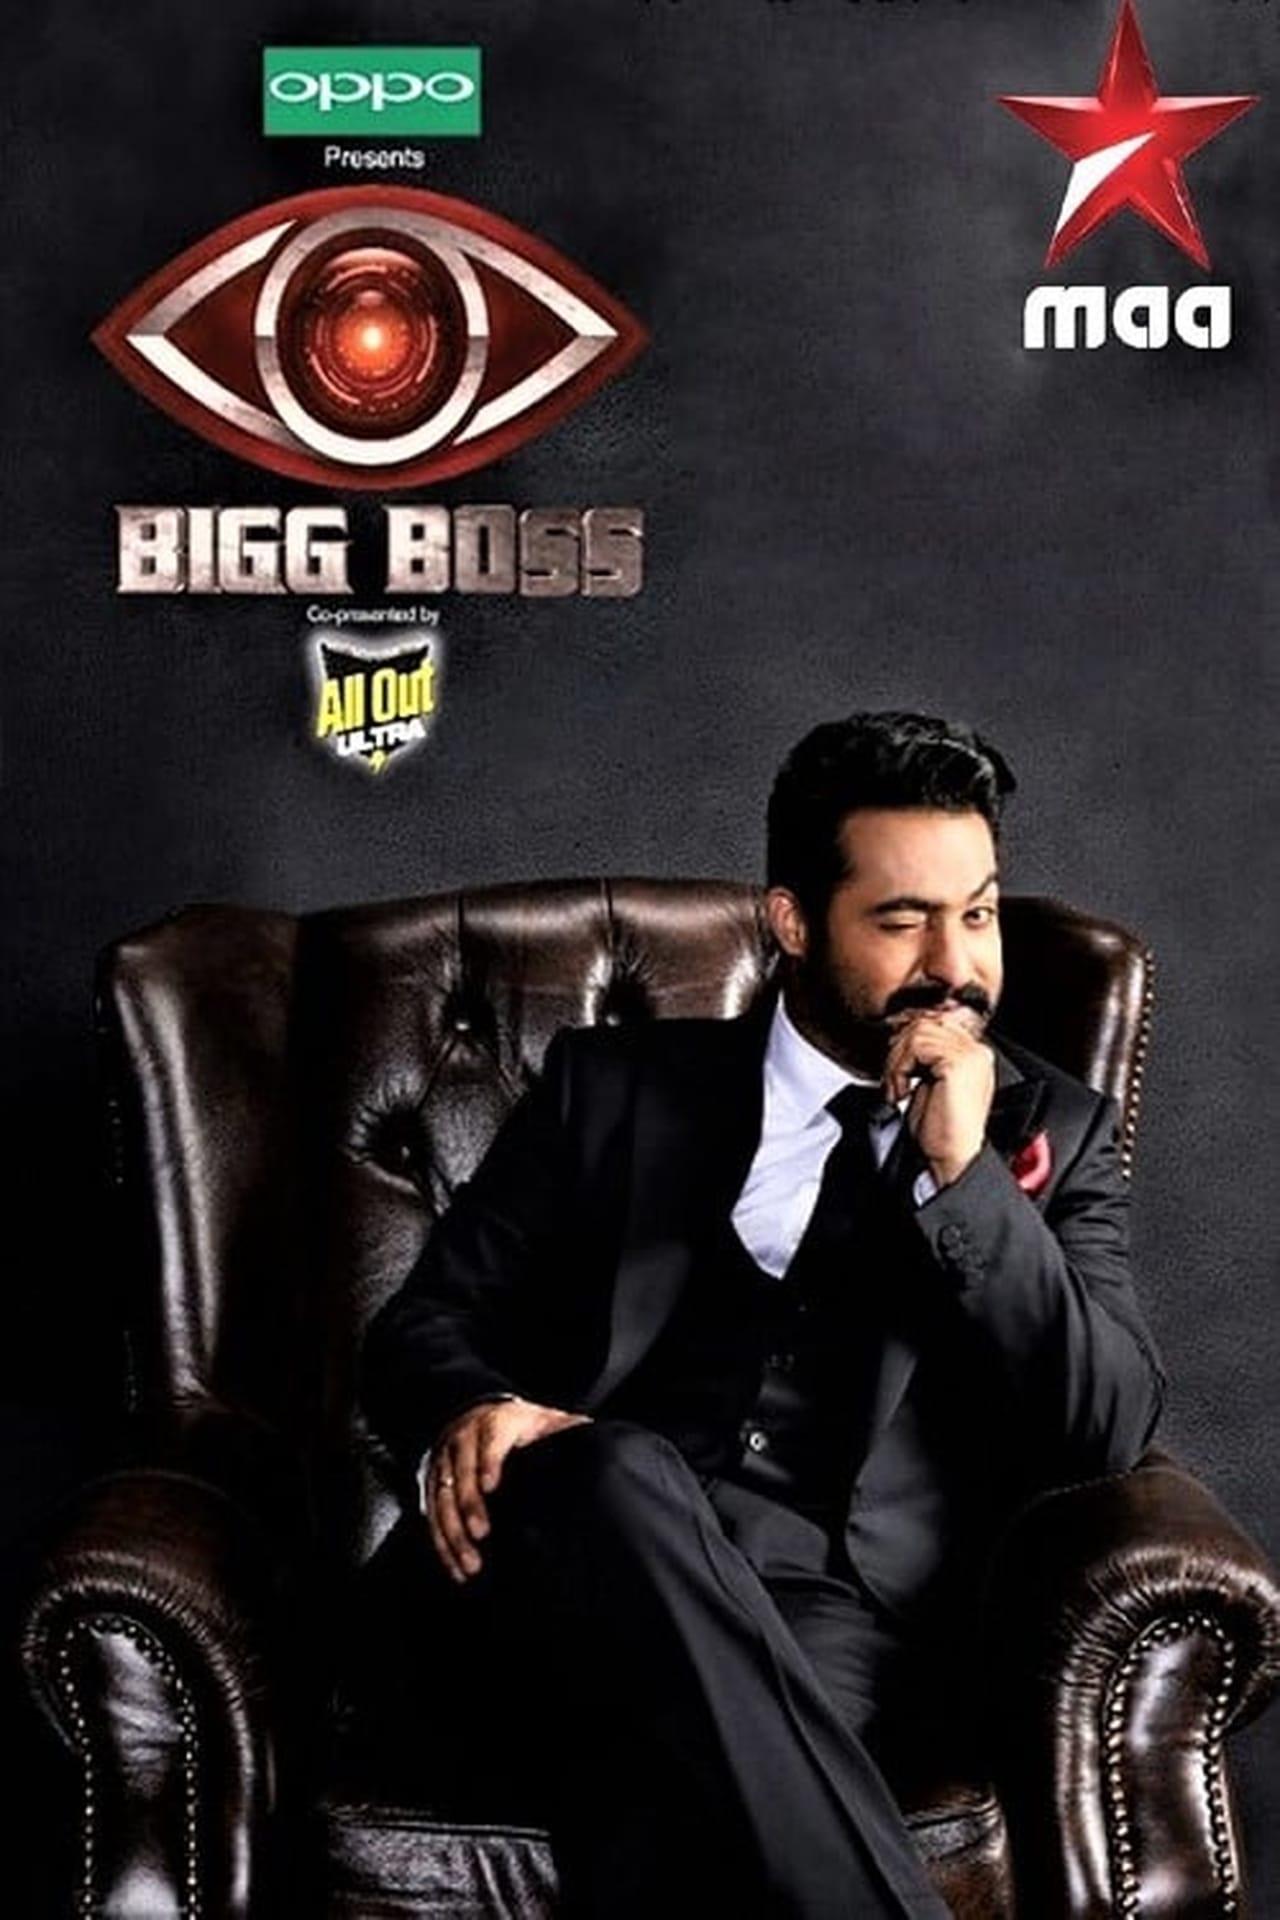 Watch Bigg Boss Season 1 Online